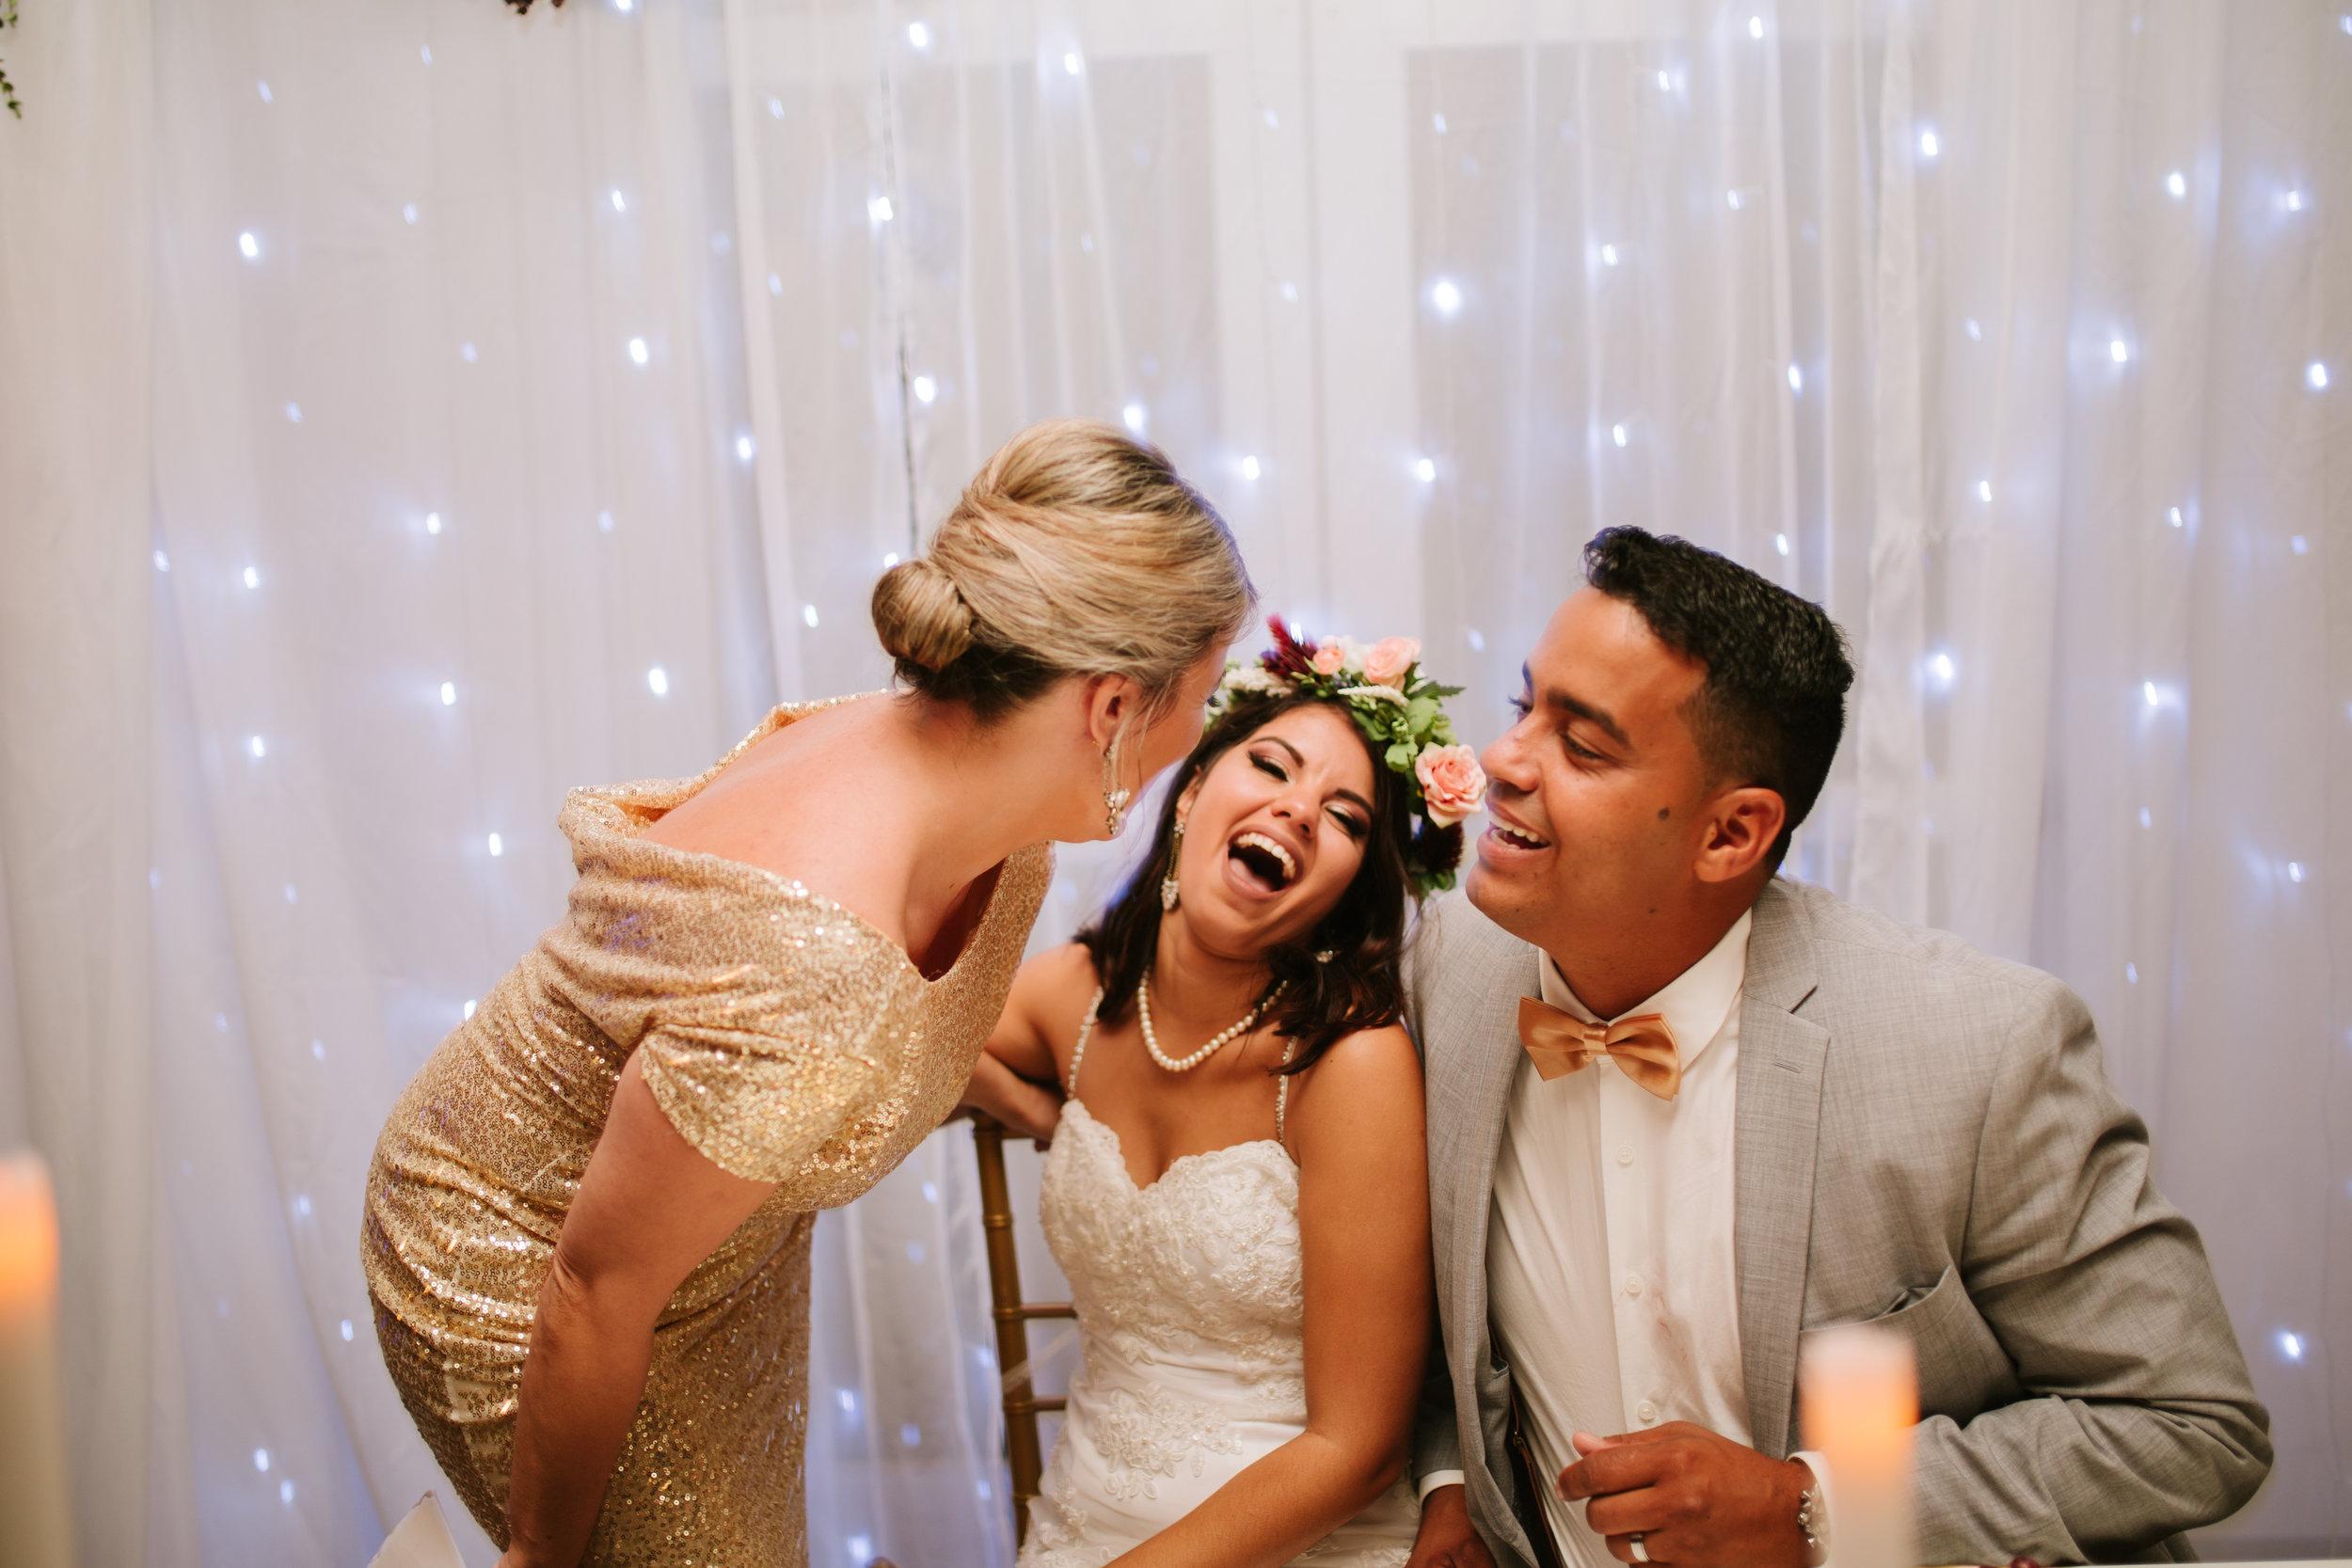 2017.05.23 Barbara and Mauricio Sales Port St Lucie Wedding (675 of 772).jpg